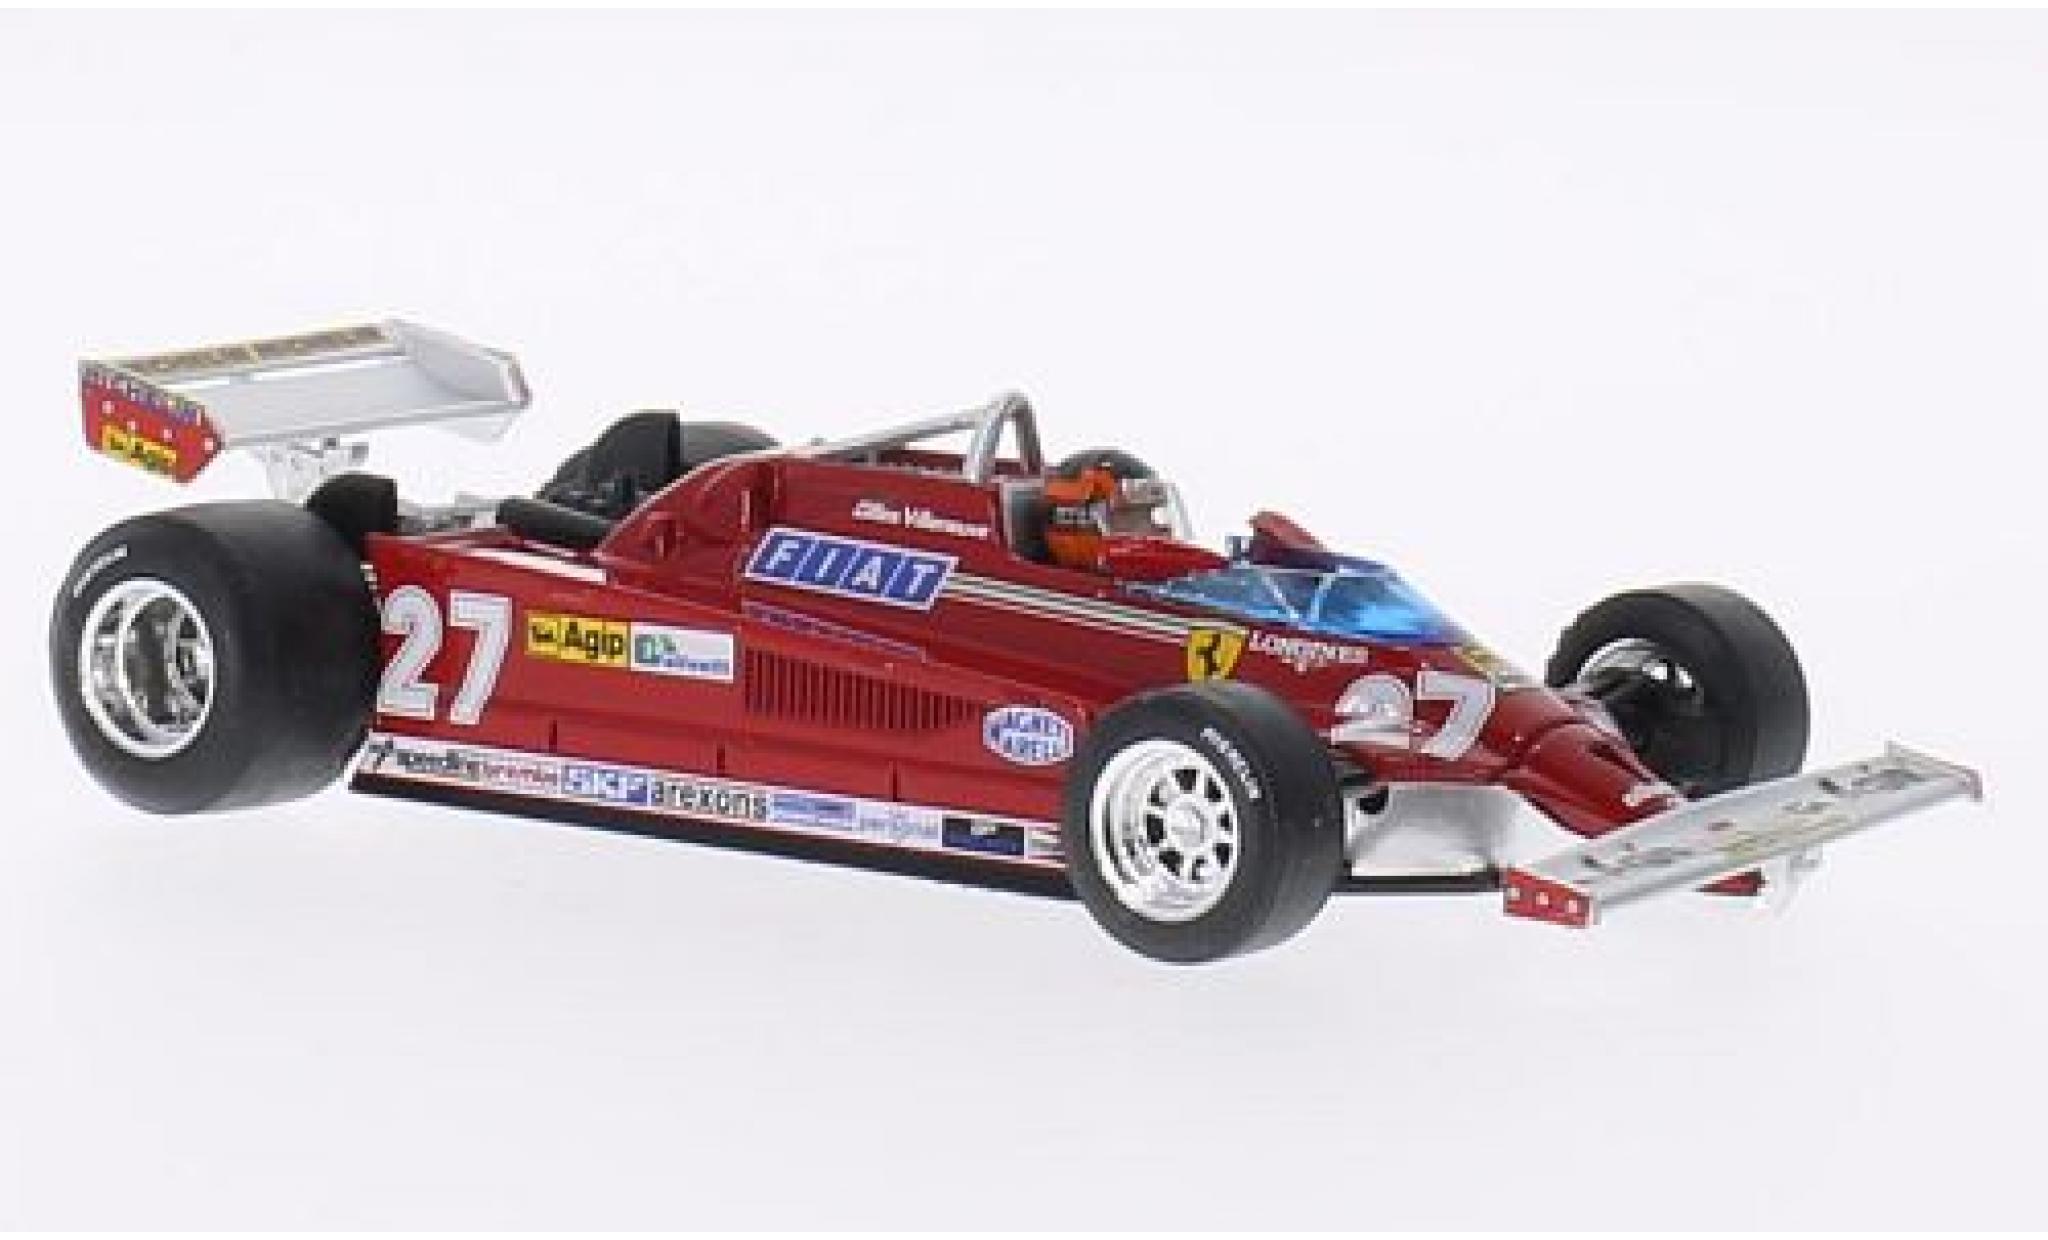 Ferrari 126 1/43 Brumm CK Turbo No.27 Scuderia Formel 1 GP Italien 1981 avec figurine de conducteur G.Villeneuve